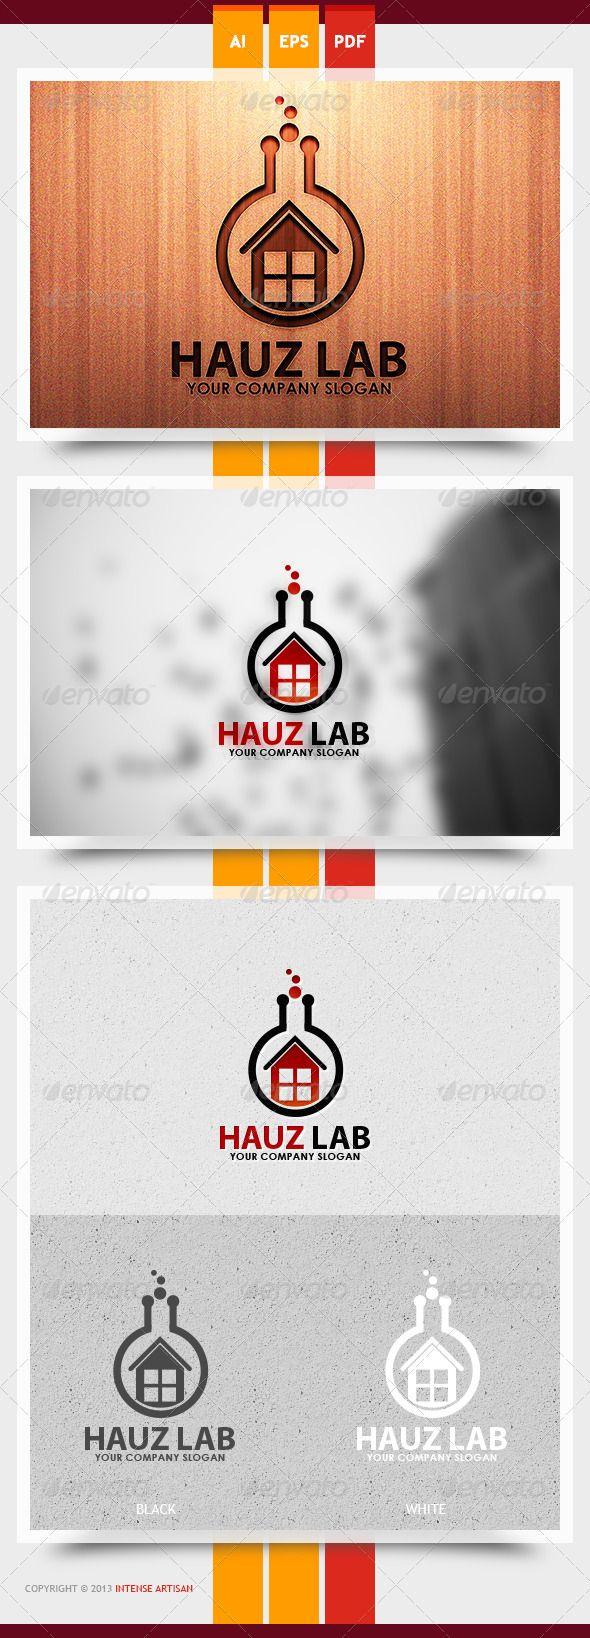 Hauz Lab Logo Design Template Vector logotype Download it